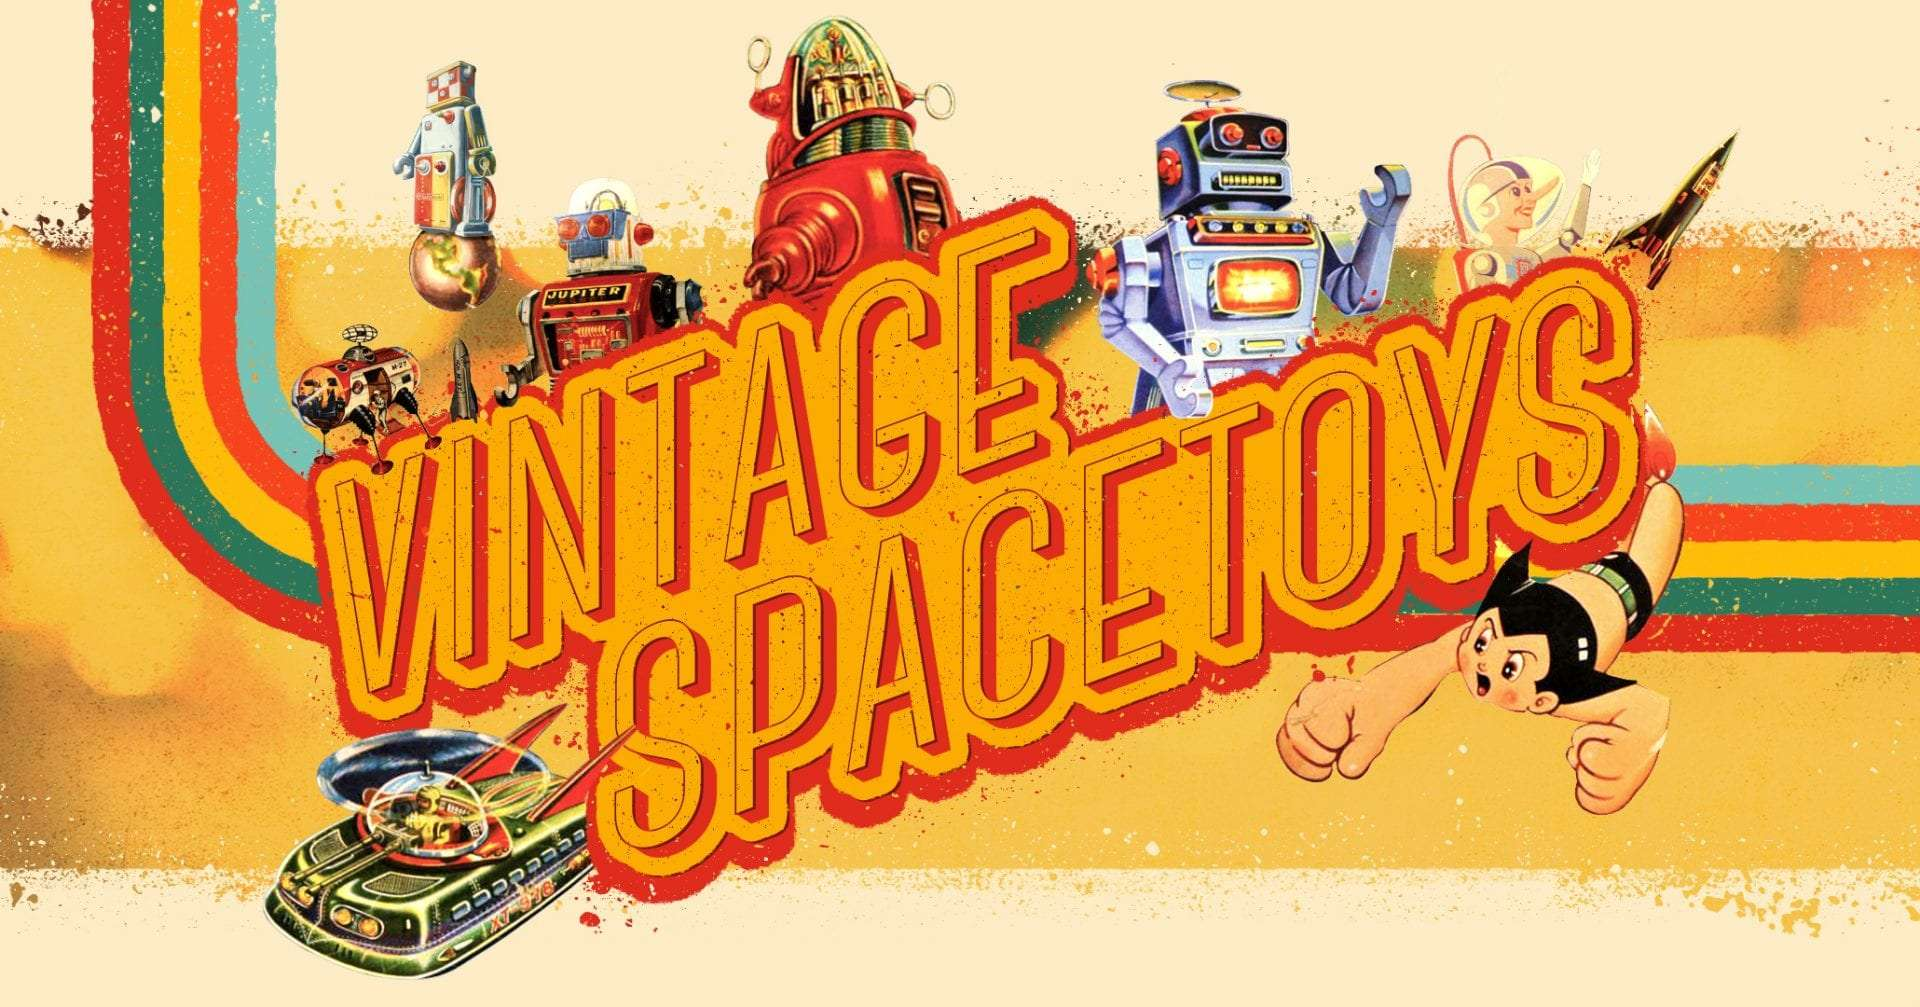 Vintage spacetoys